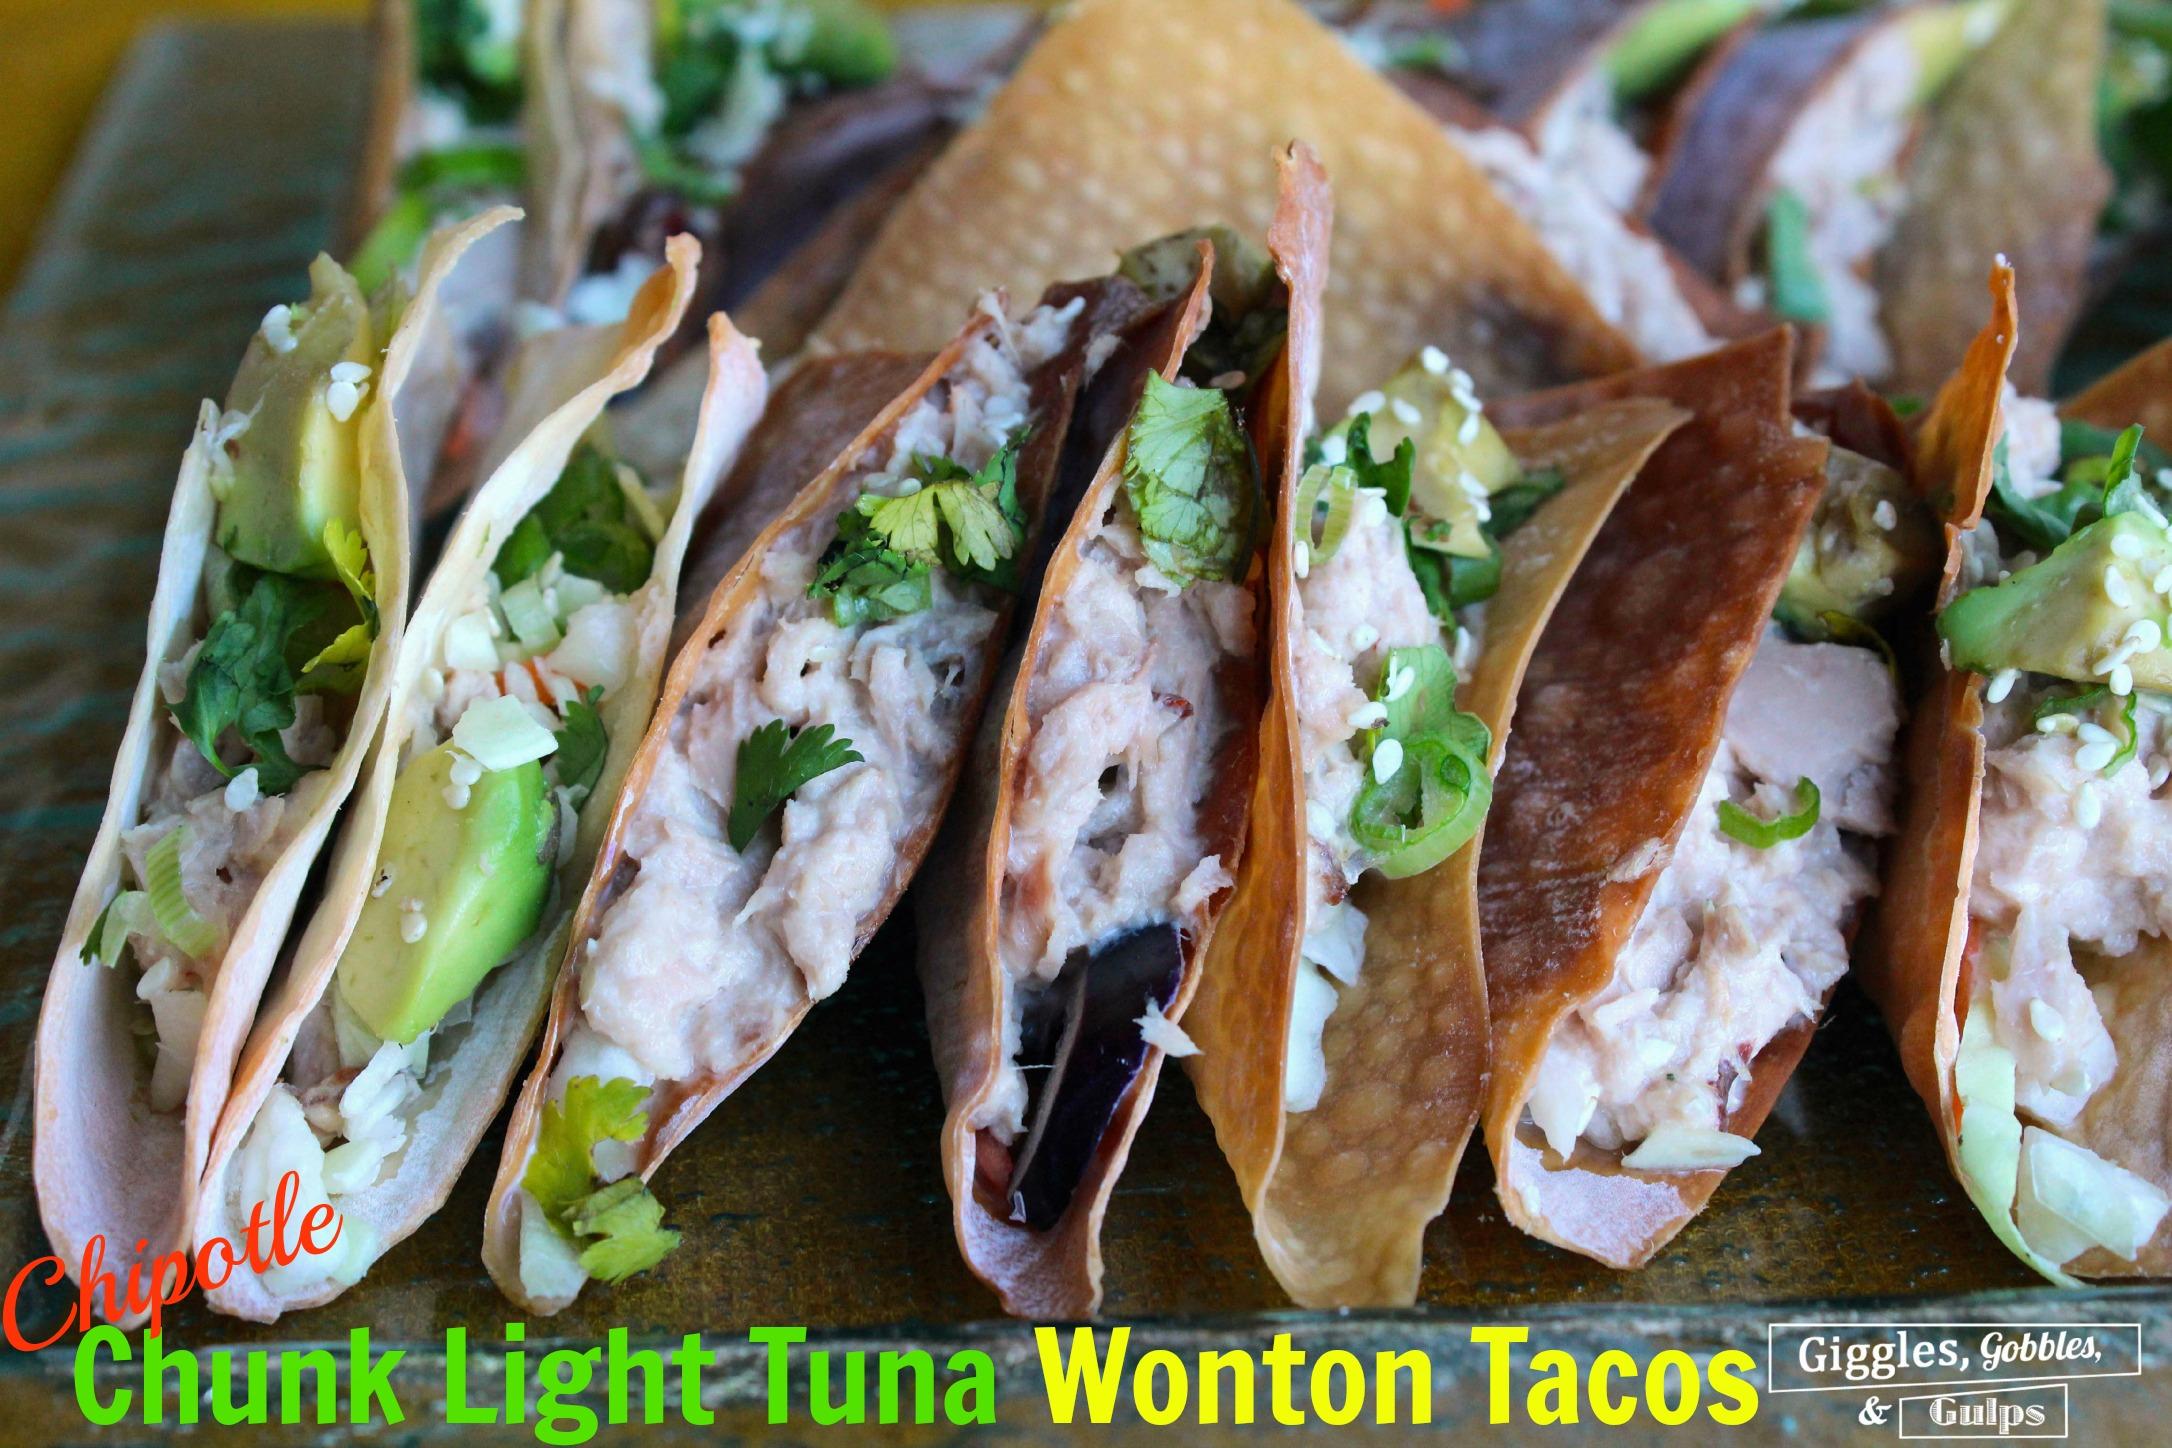 Chunk Light Tuna Wonton Tacos